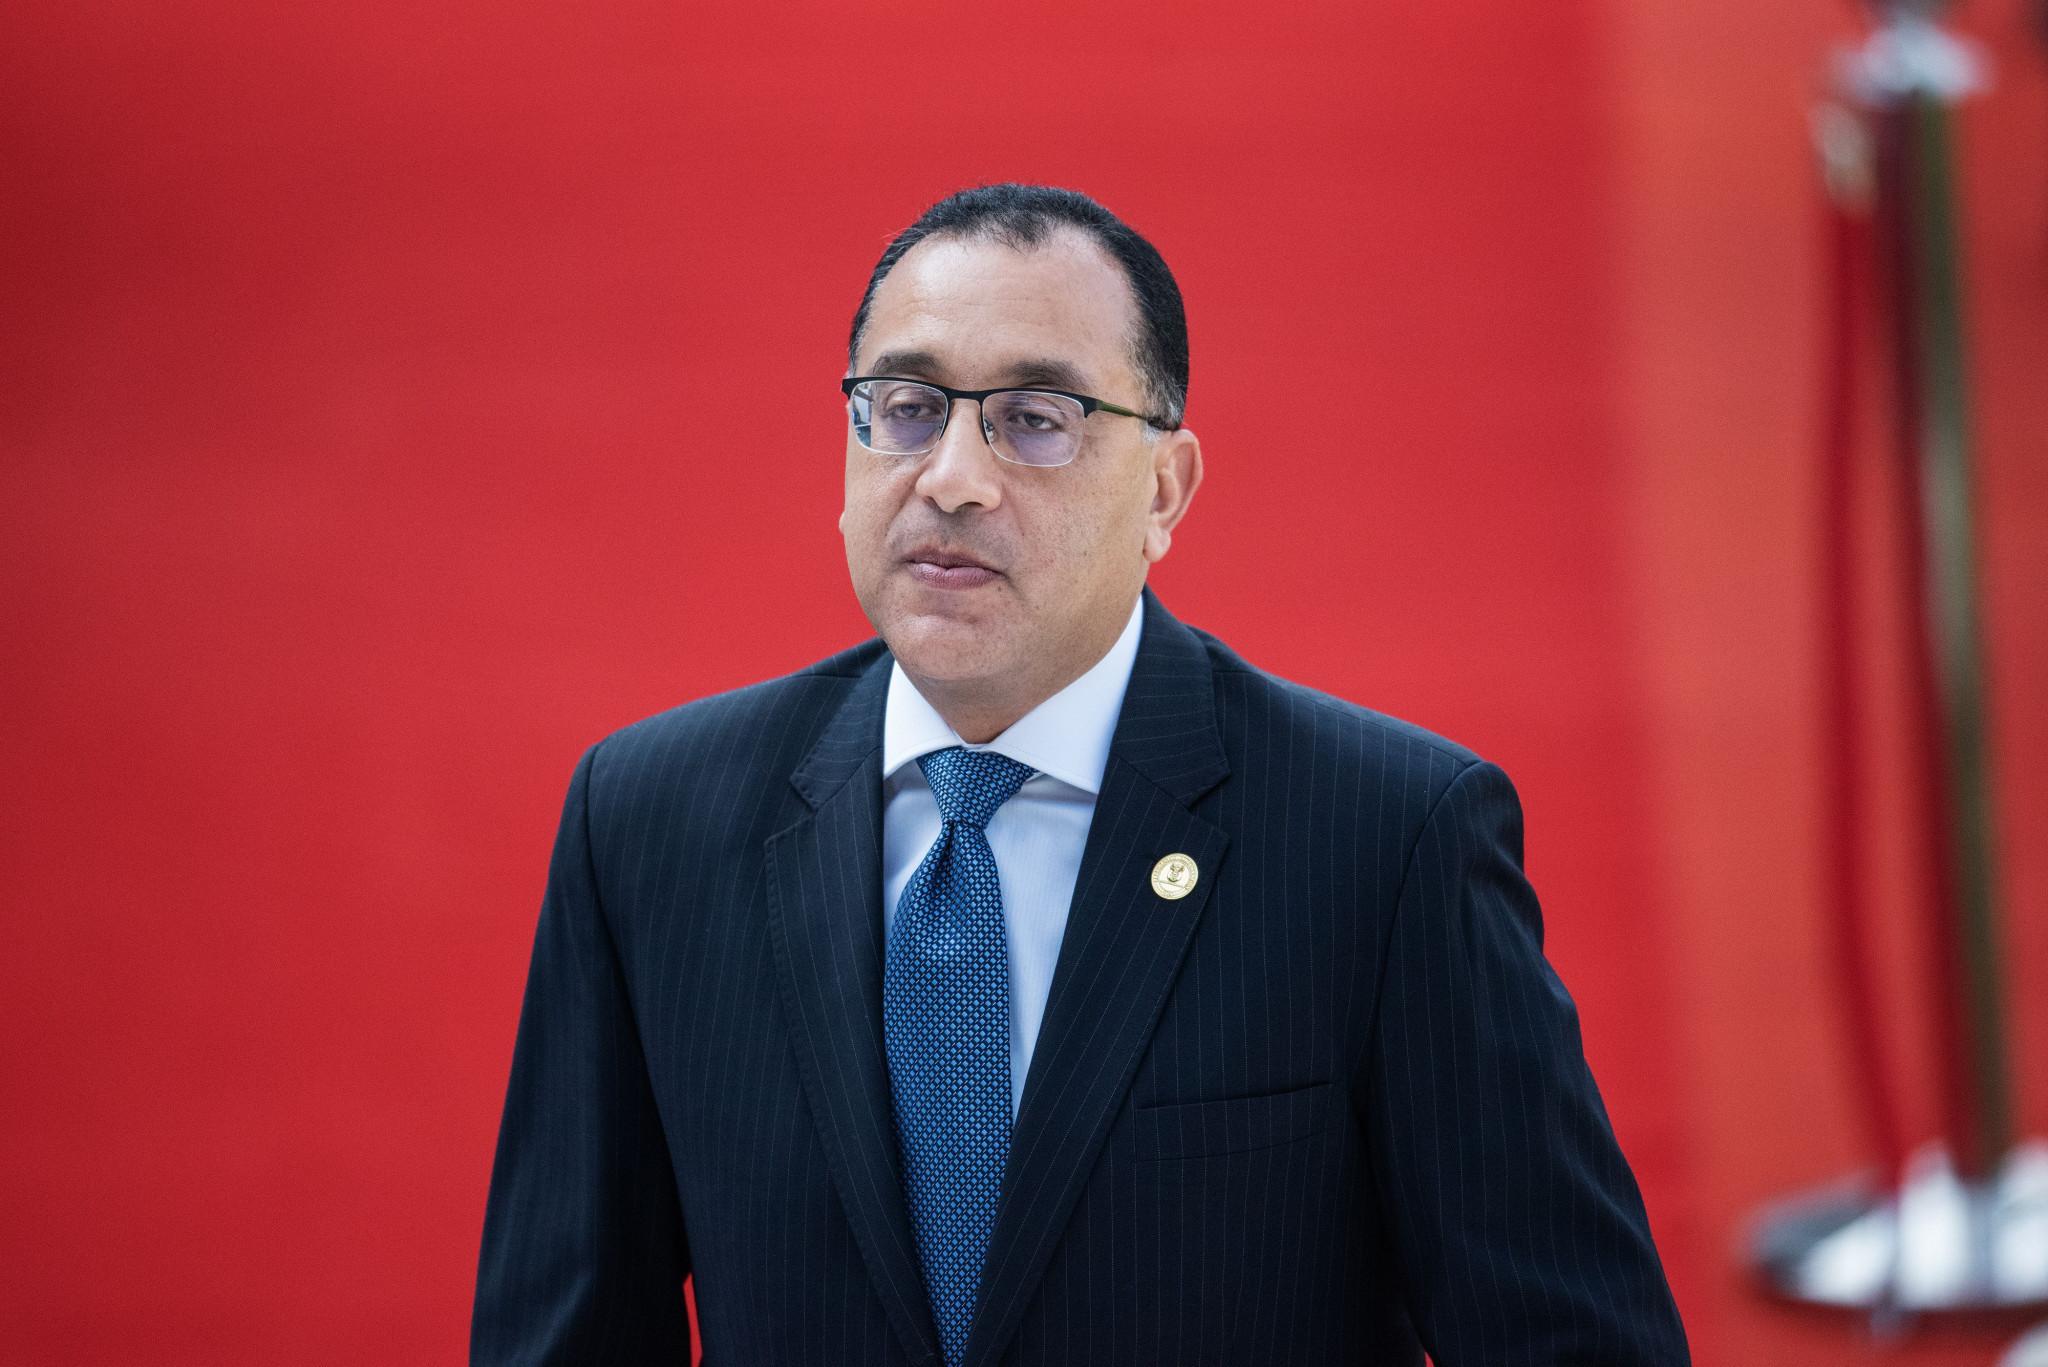 Egyptian Prime Minister hosts COVID-19 planning meeting for Men's Handball World Championship